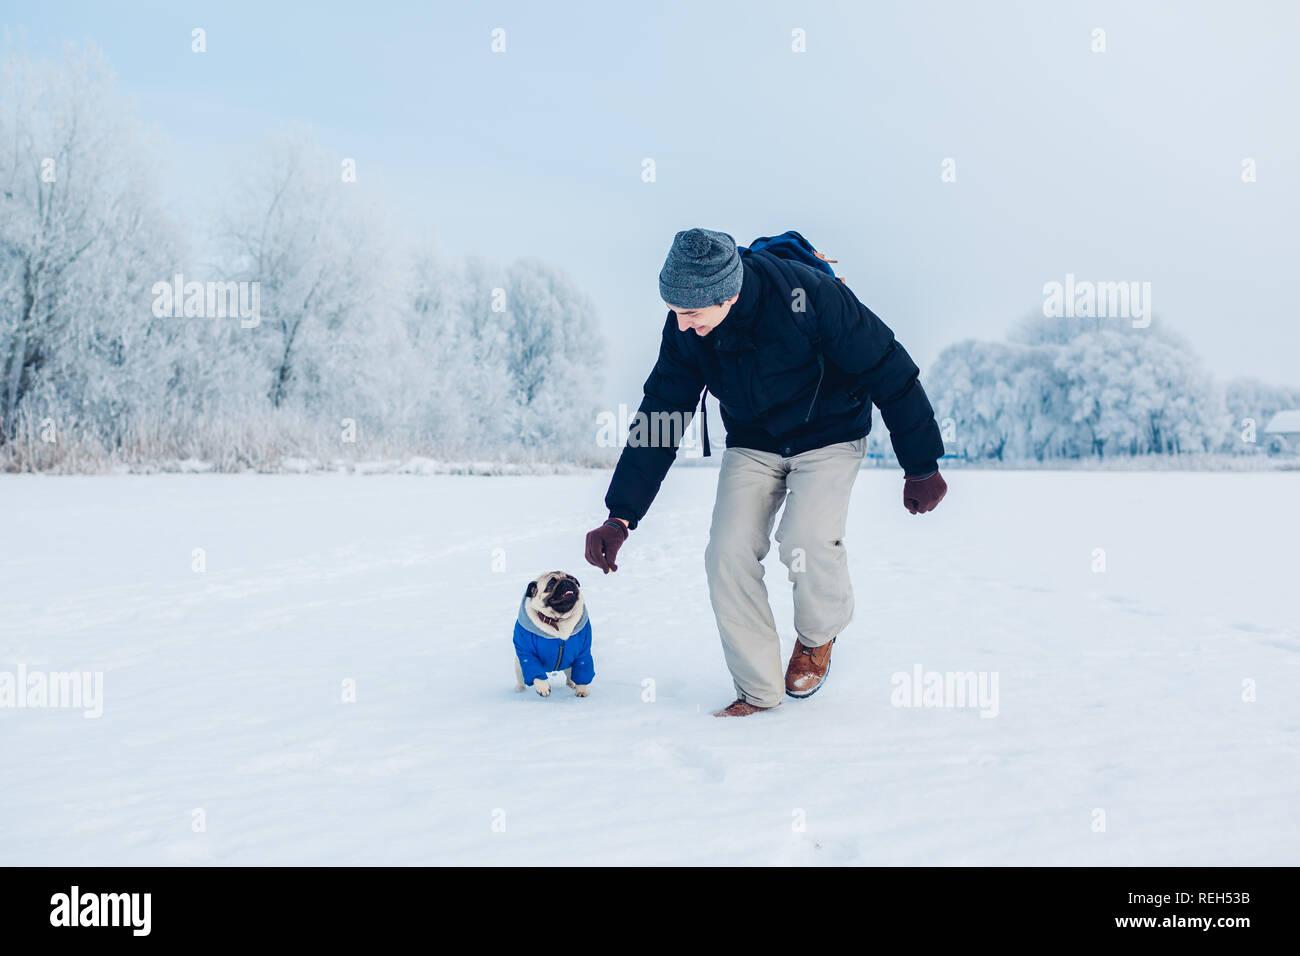 Running Snow Winter Puppy Stock Photos & Running Snow